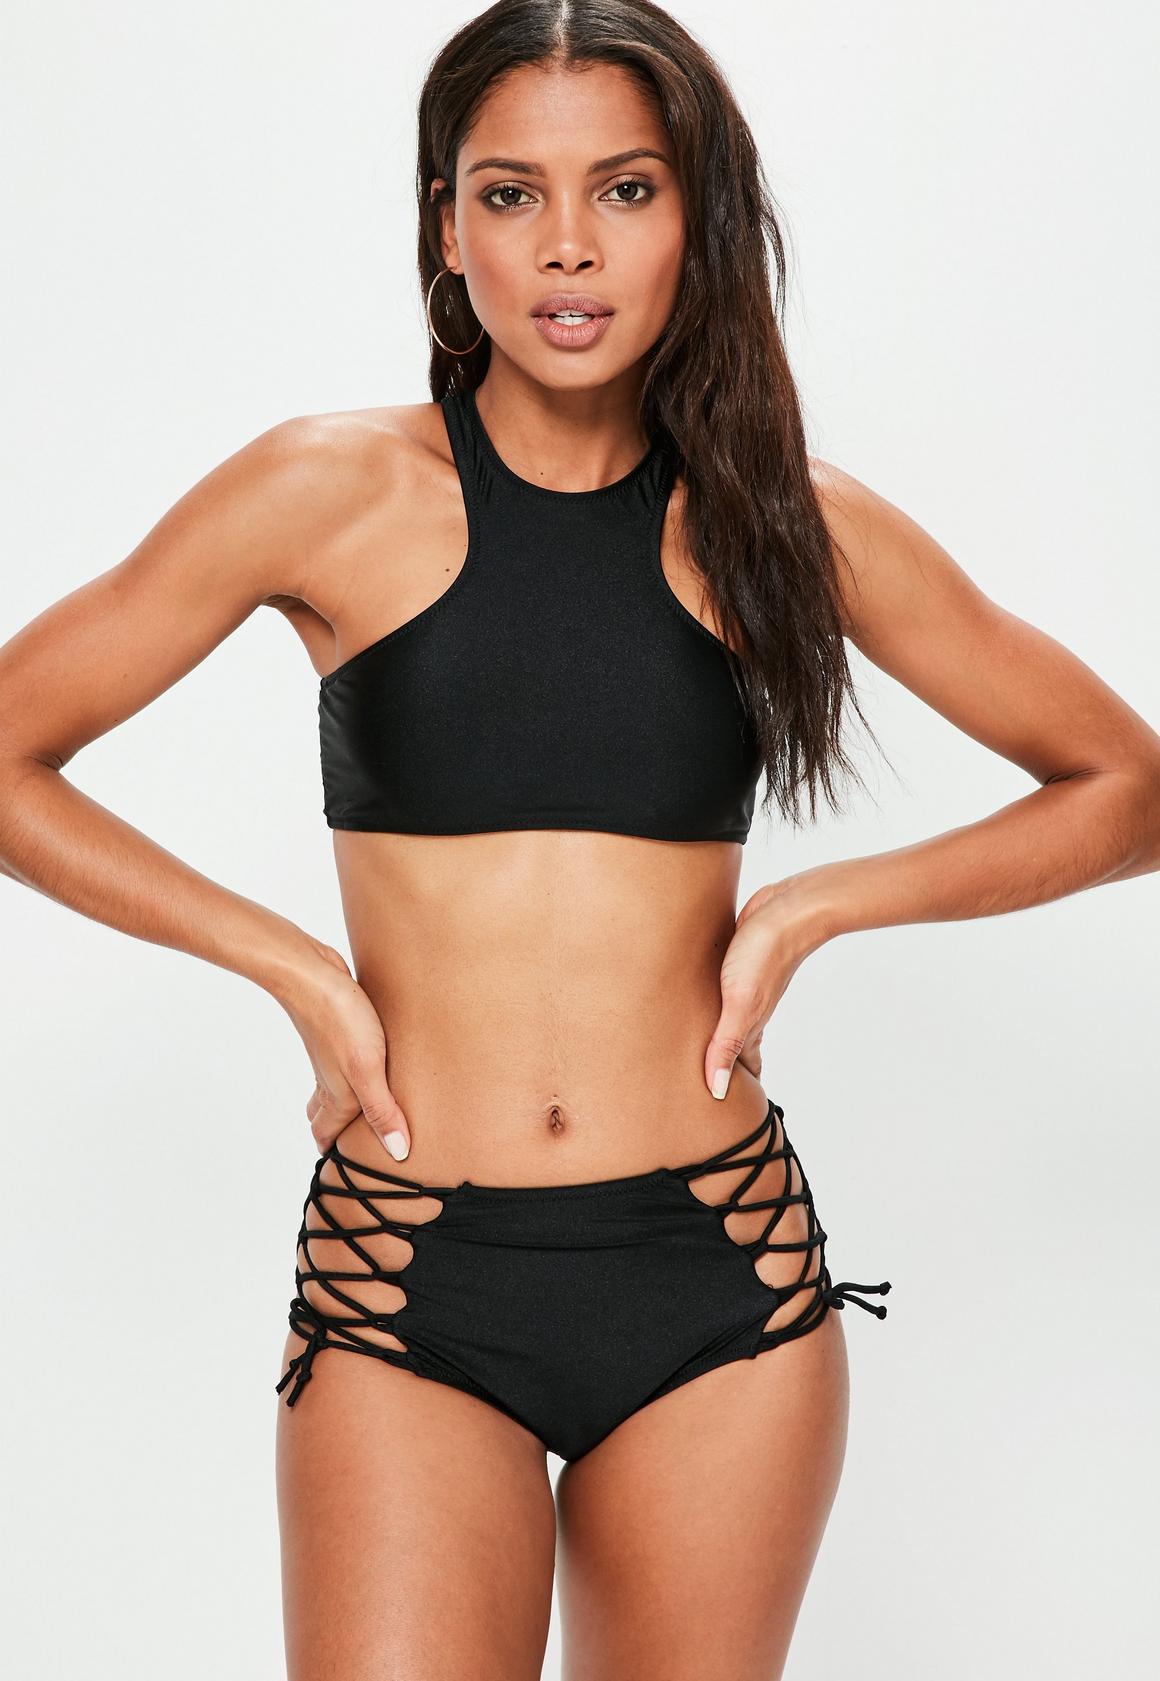 Bikini models wallpaper